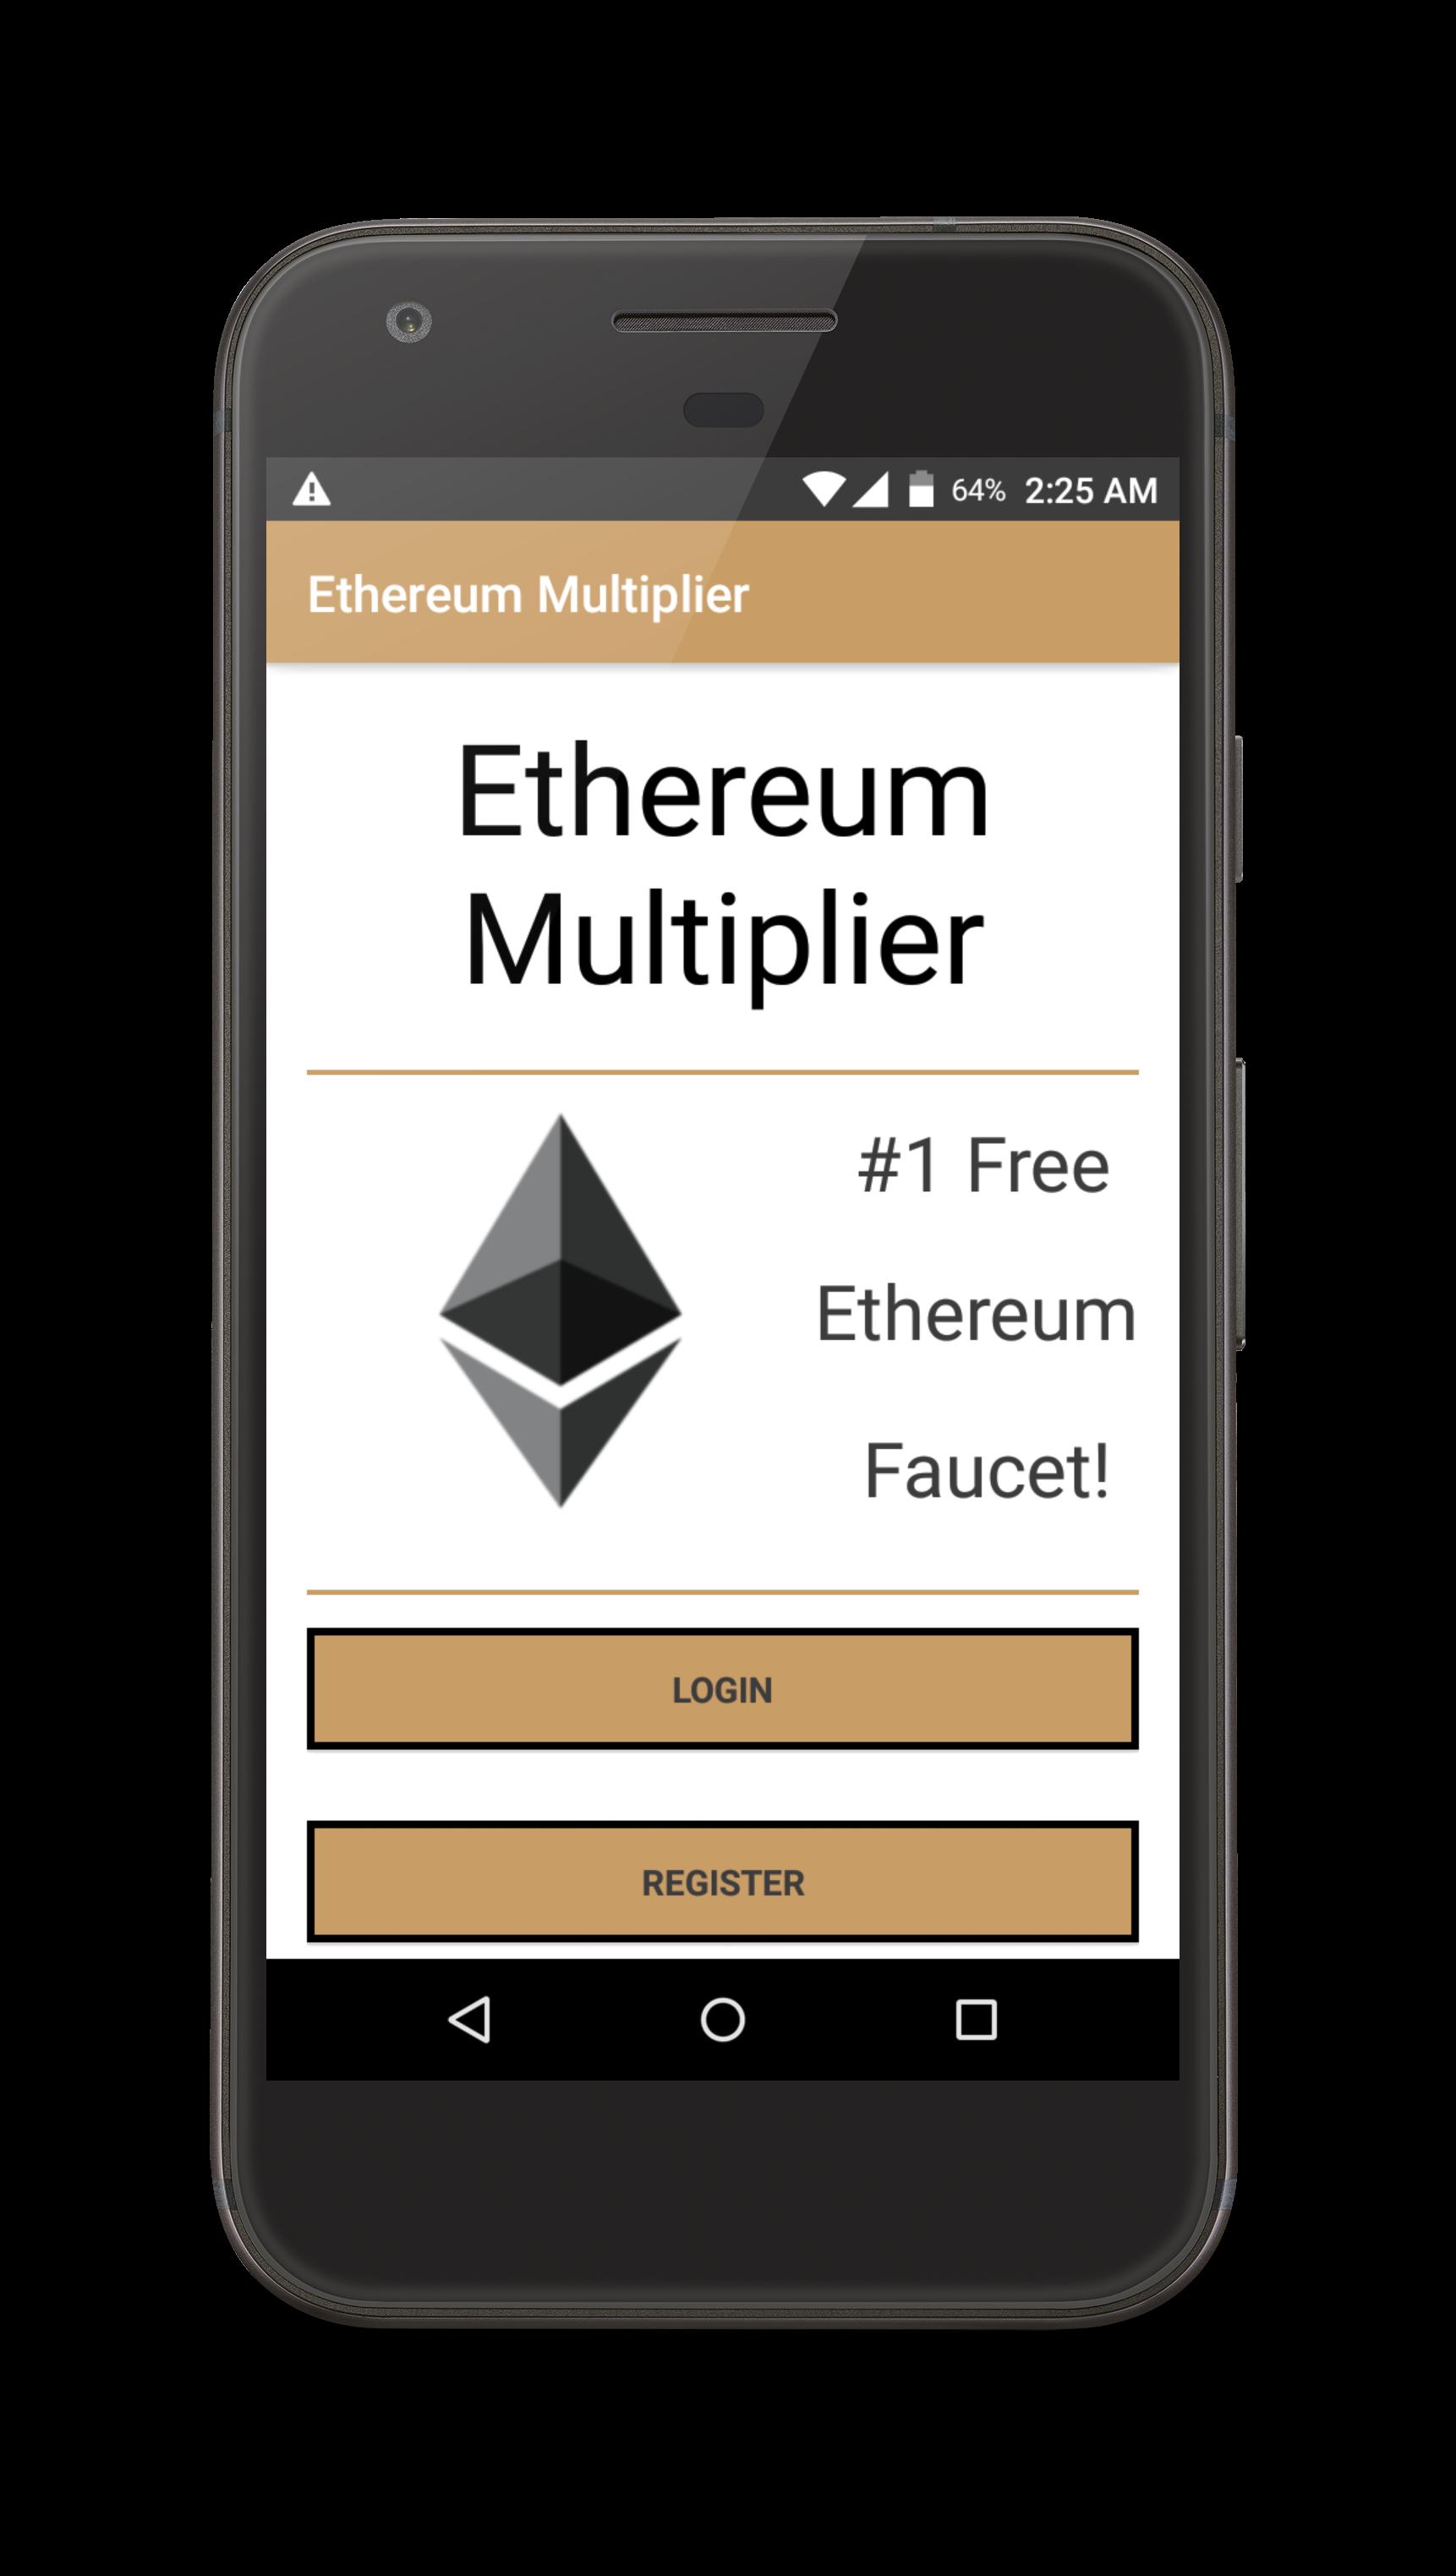 Ethereum Multiplier Android App Faucet — Ethereum Community